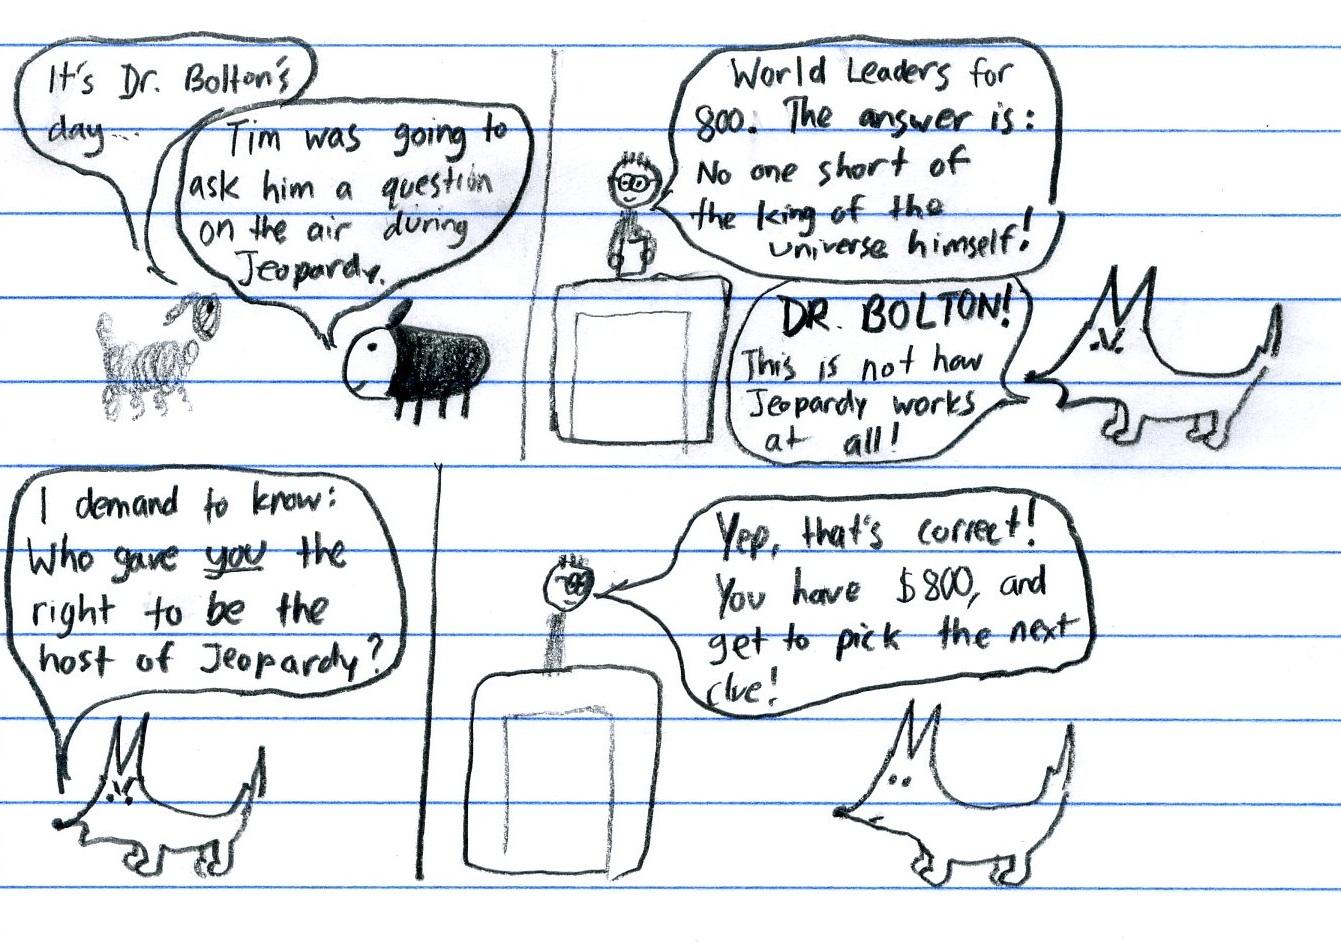 Dr. Bolton - Hosting Jeopardy